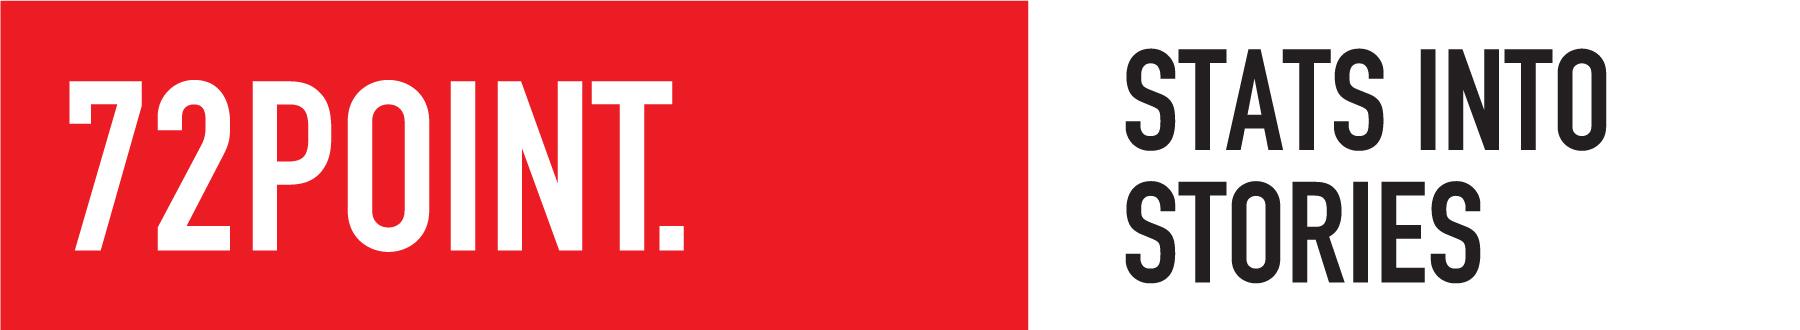 72Point-logo-slogan.jpg